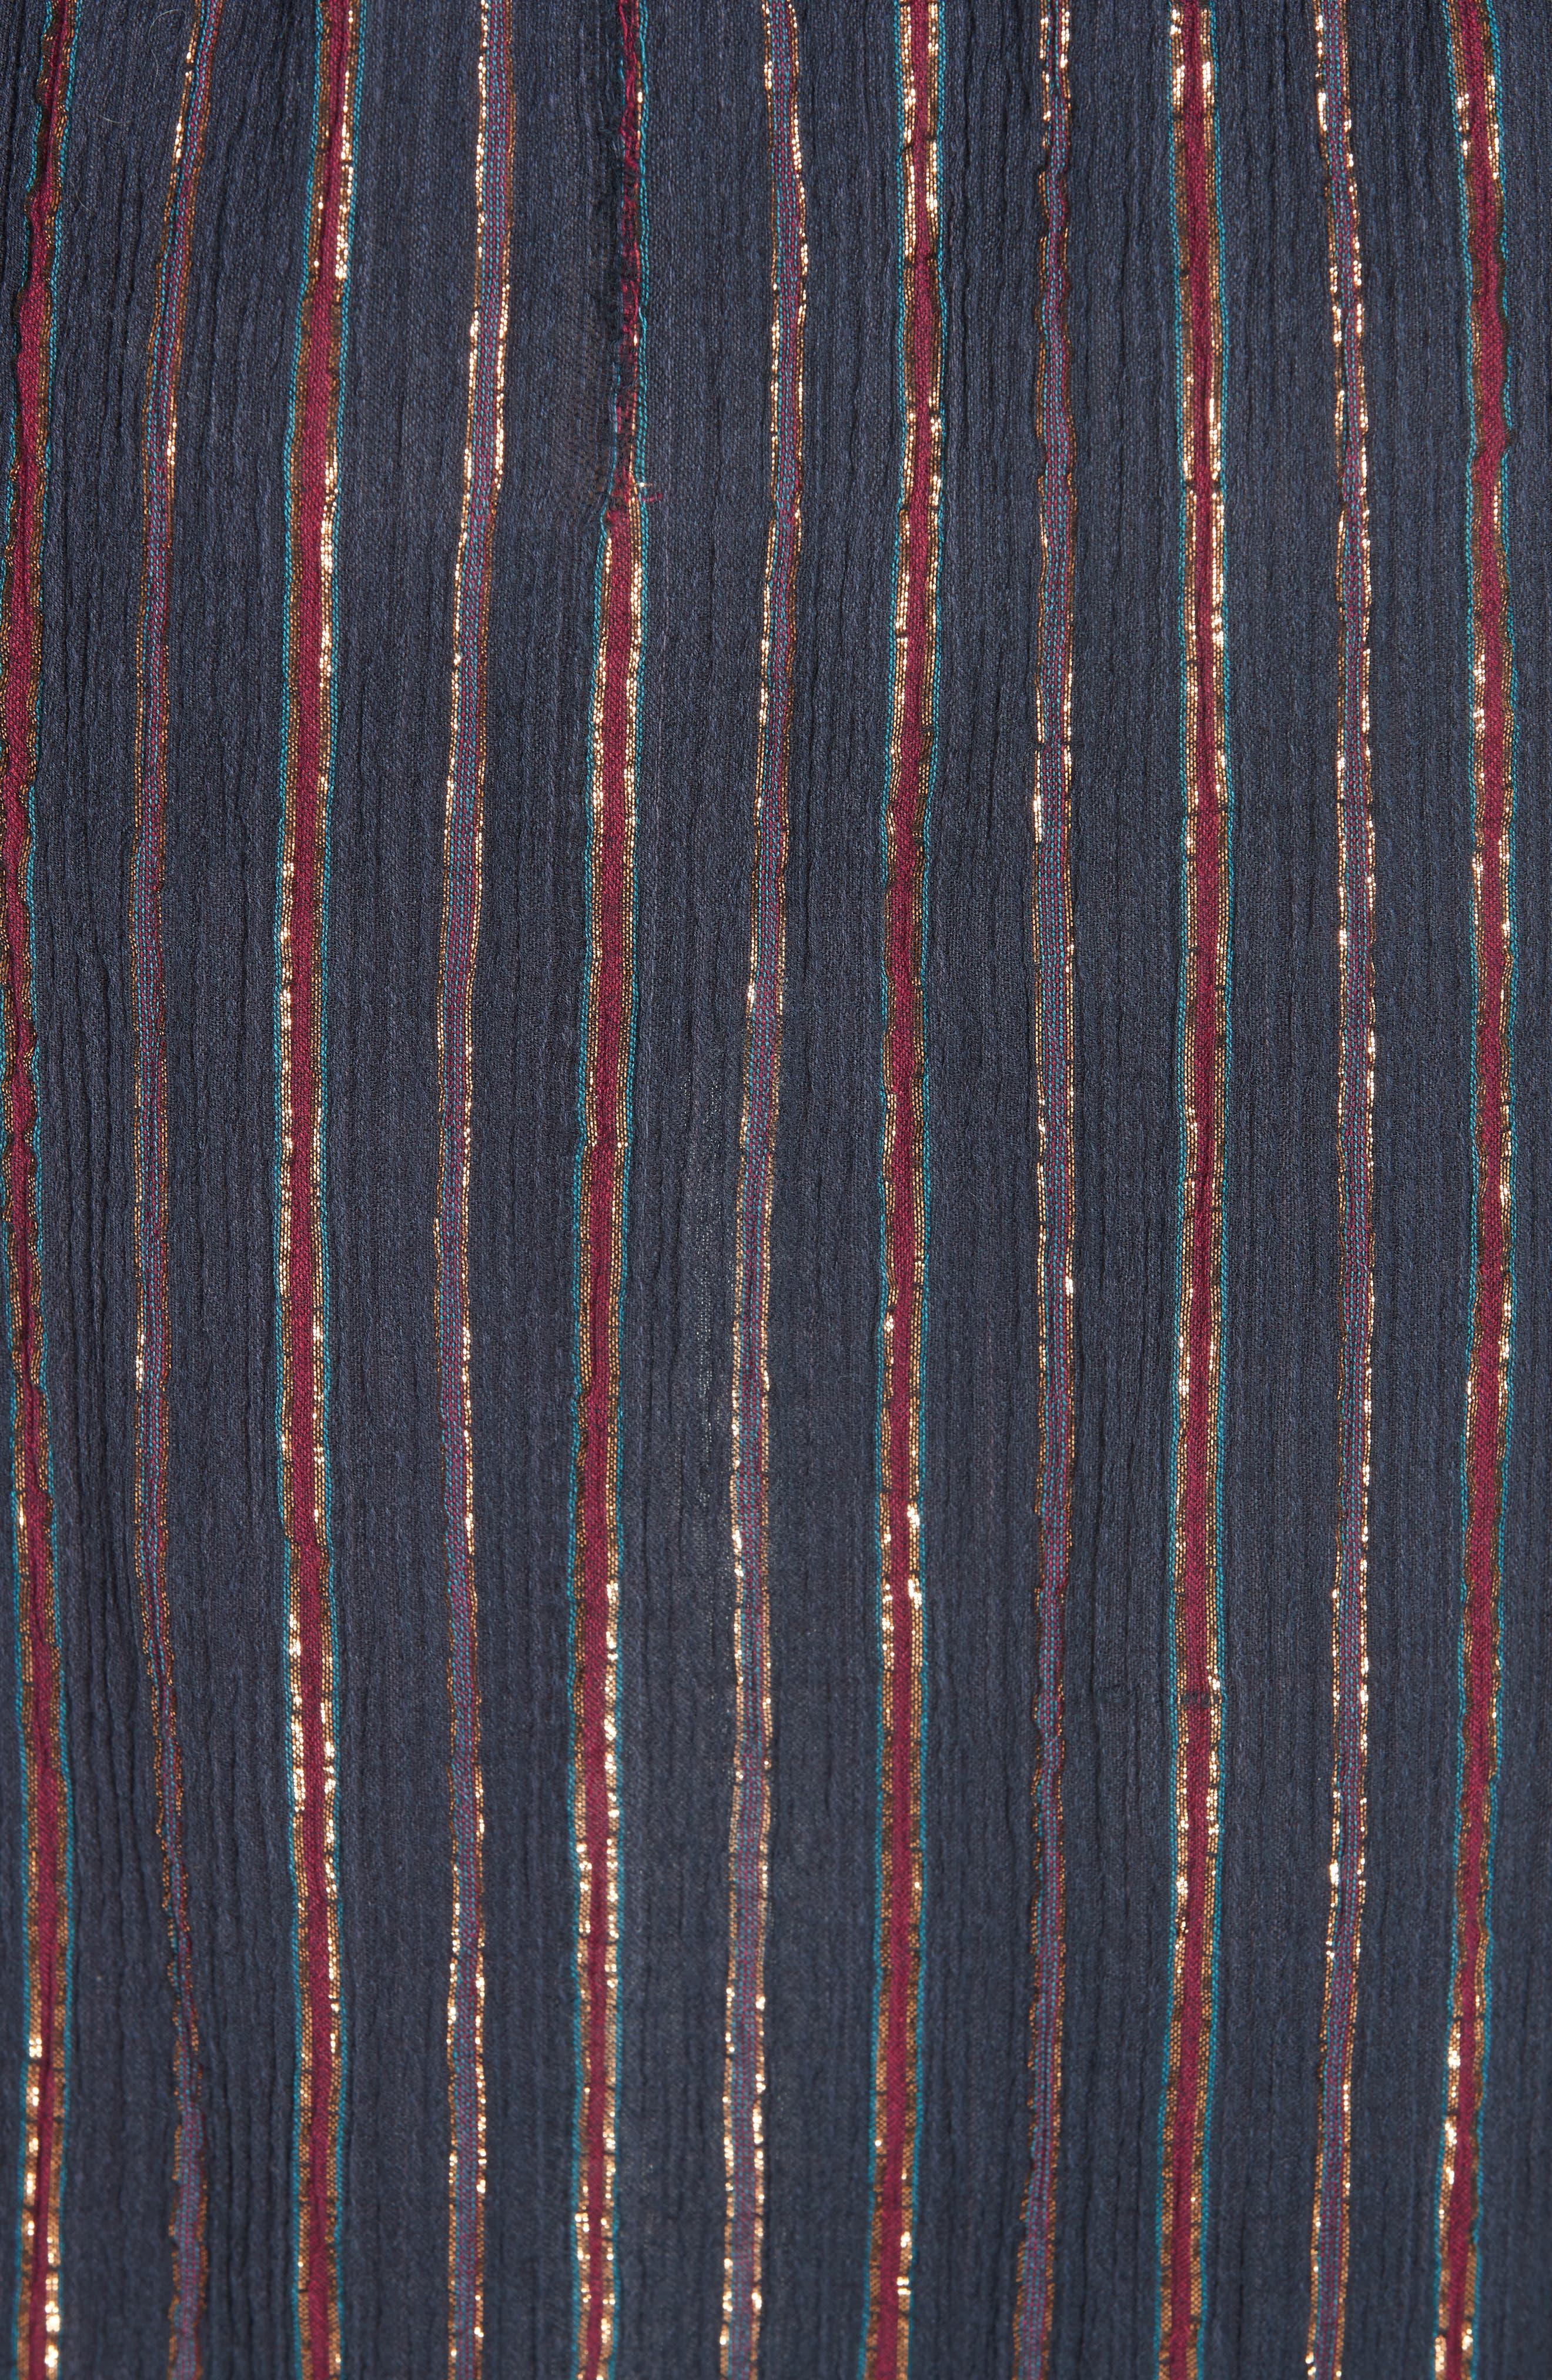 Esmeralda Lyrical Peasant Dress,                             Alternate thumbnail 5, color,                             BLUE COMBO